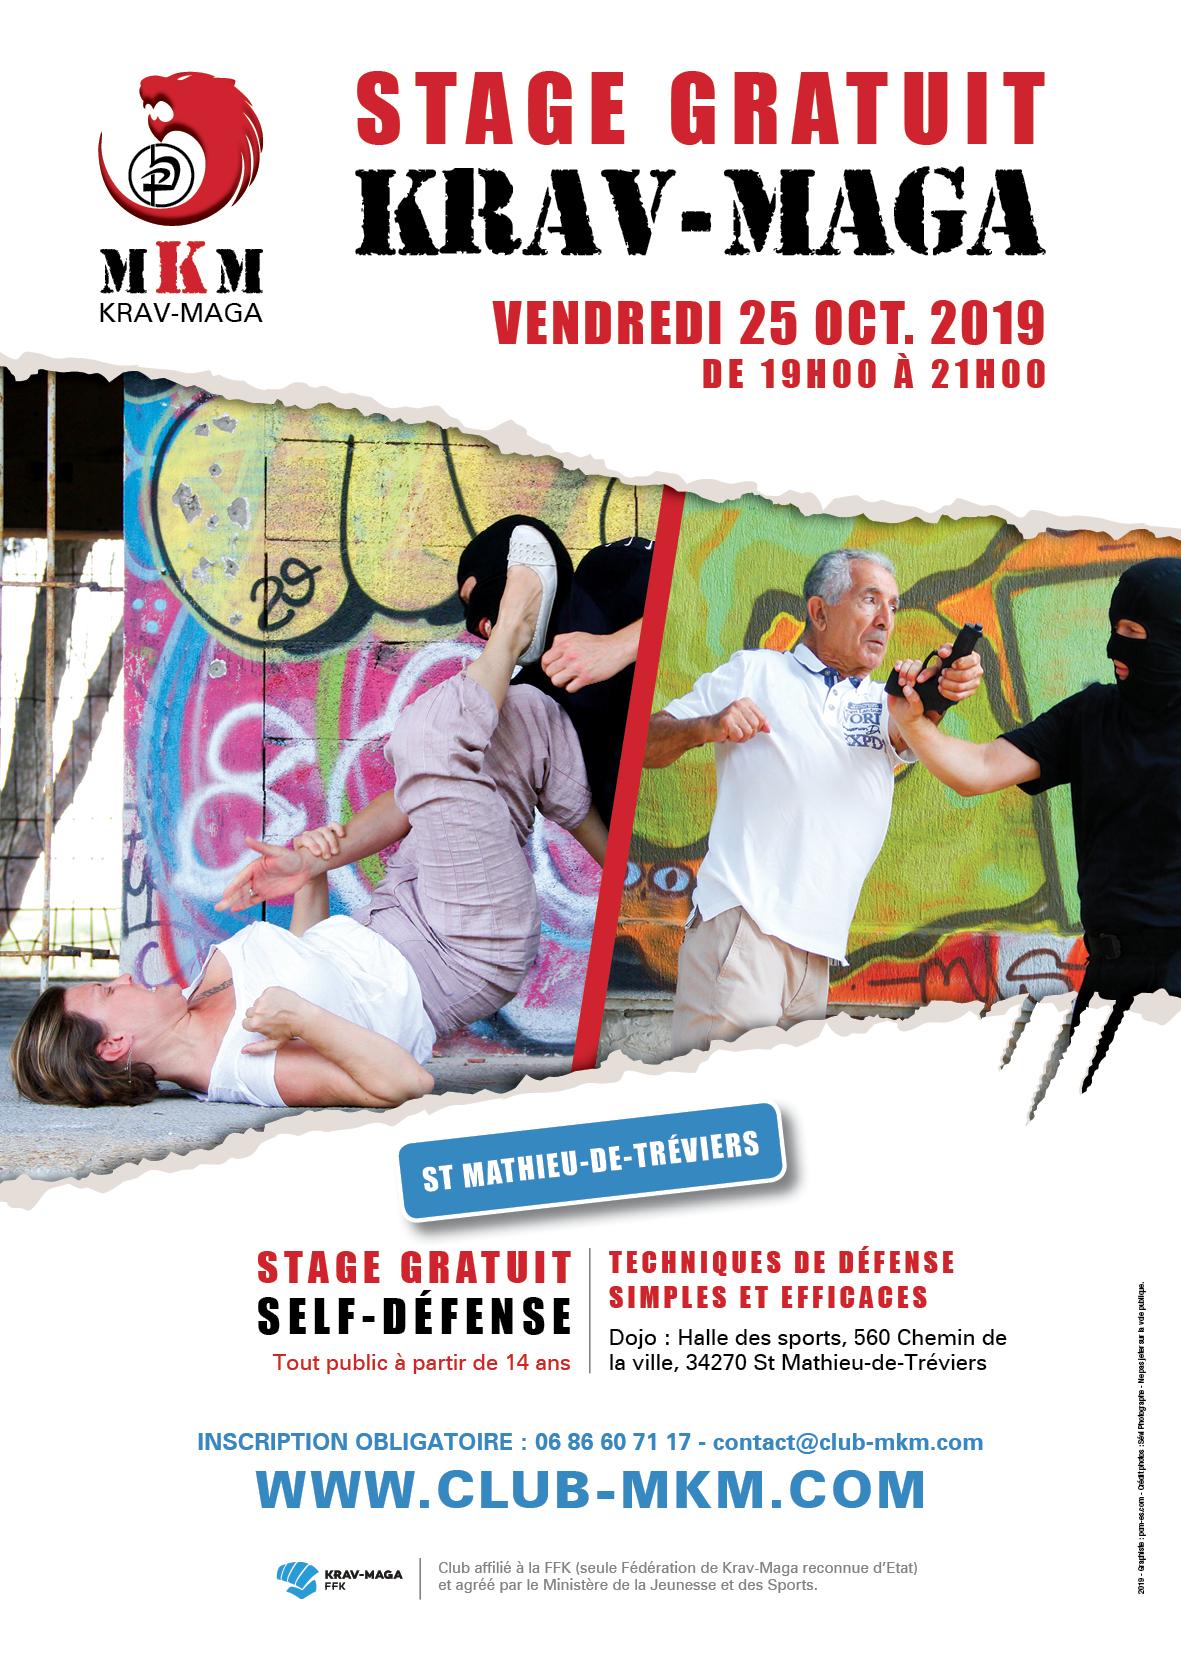 Kravmaga_Saint-Mathieu-de-treviers